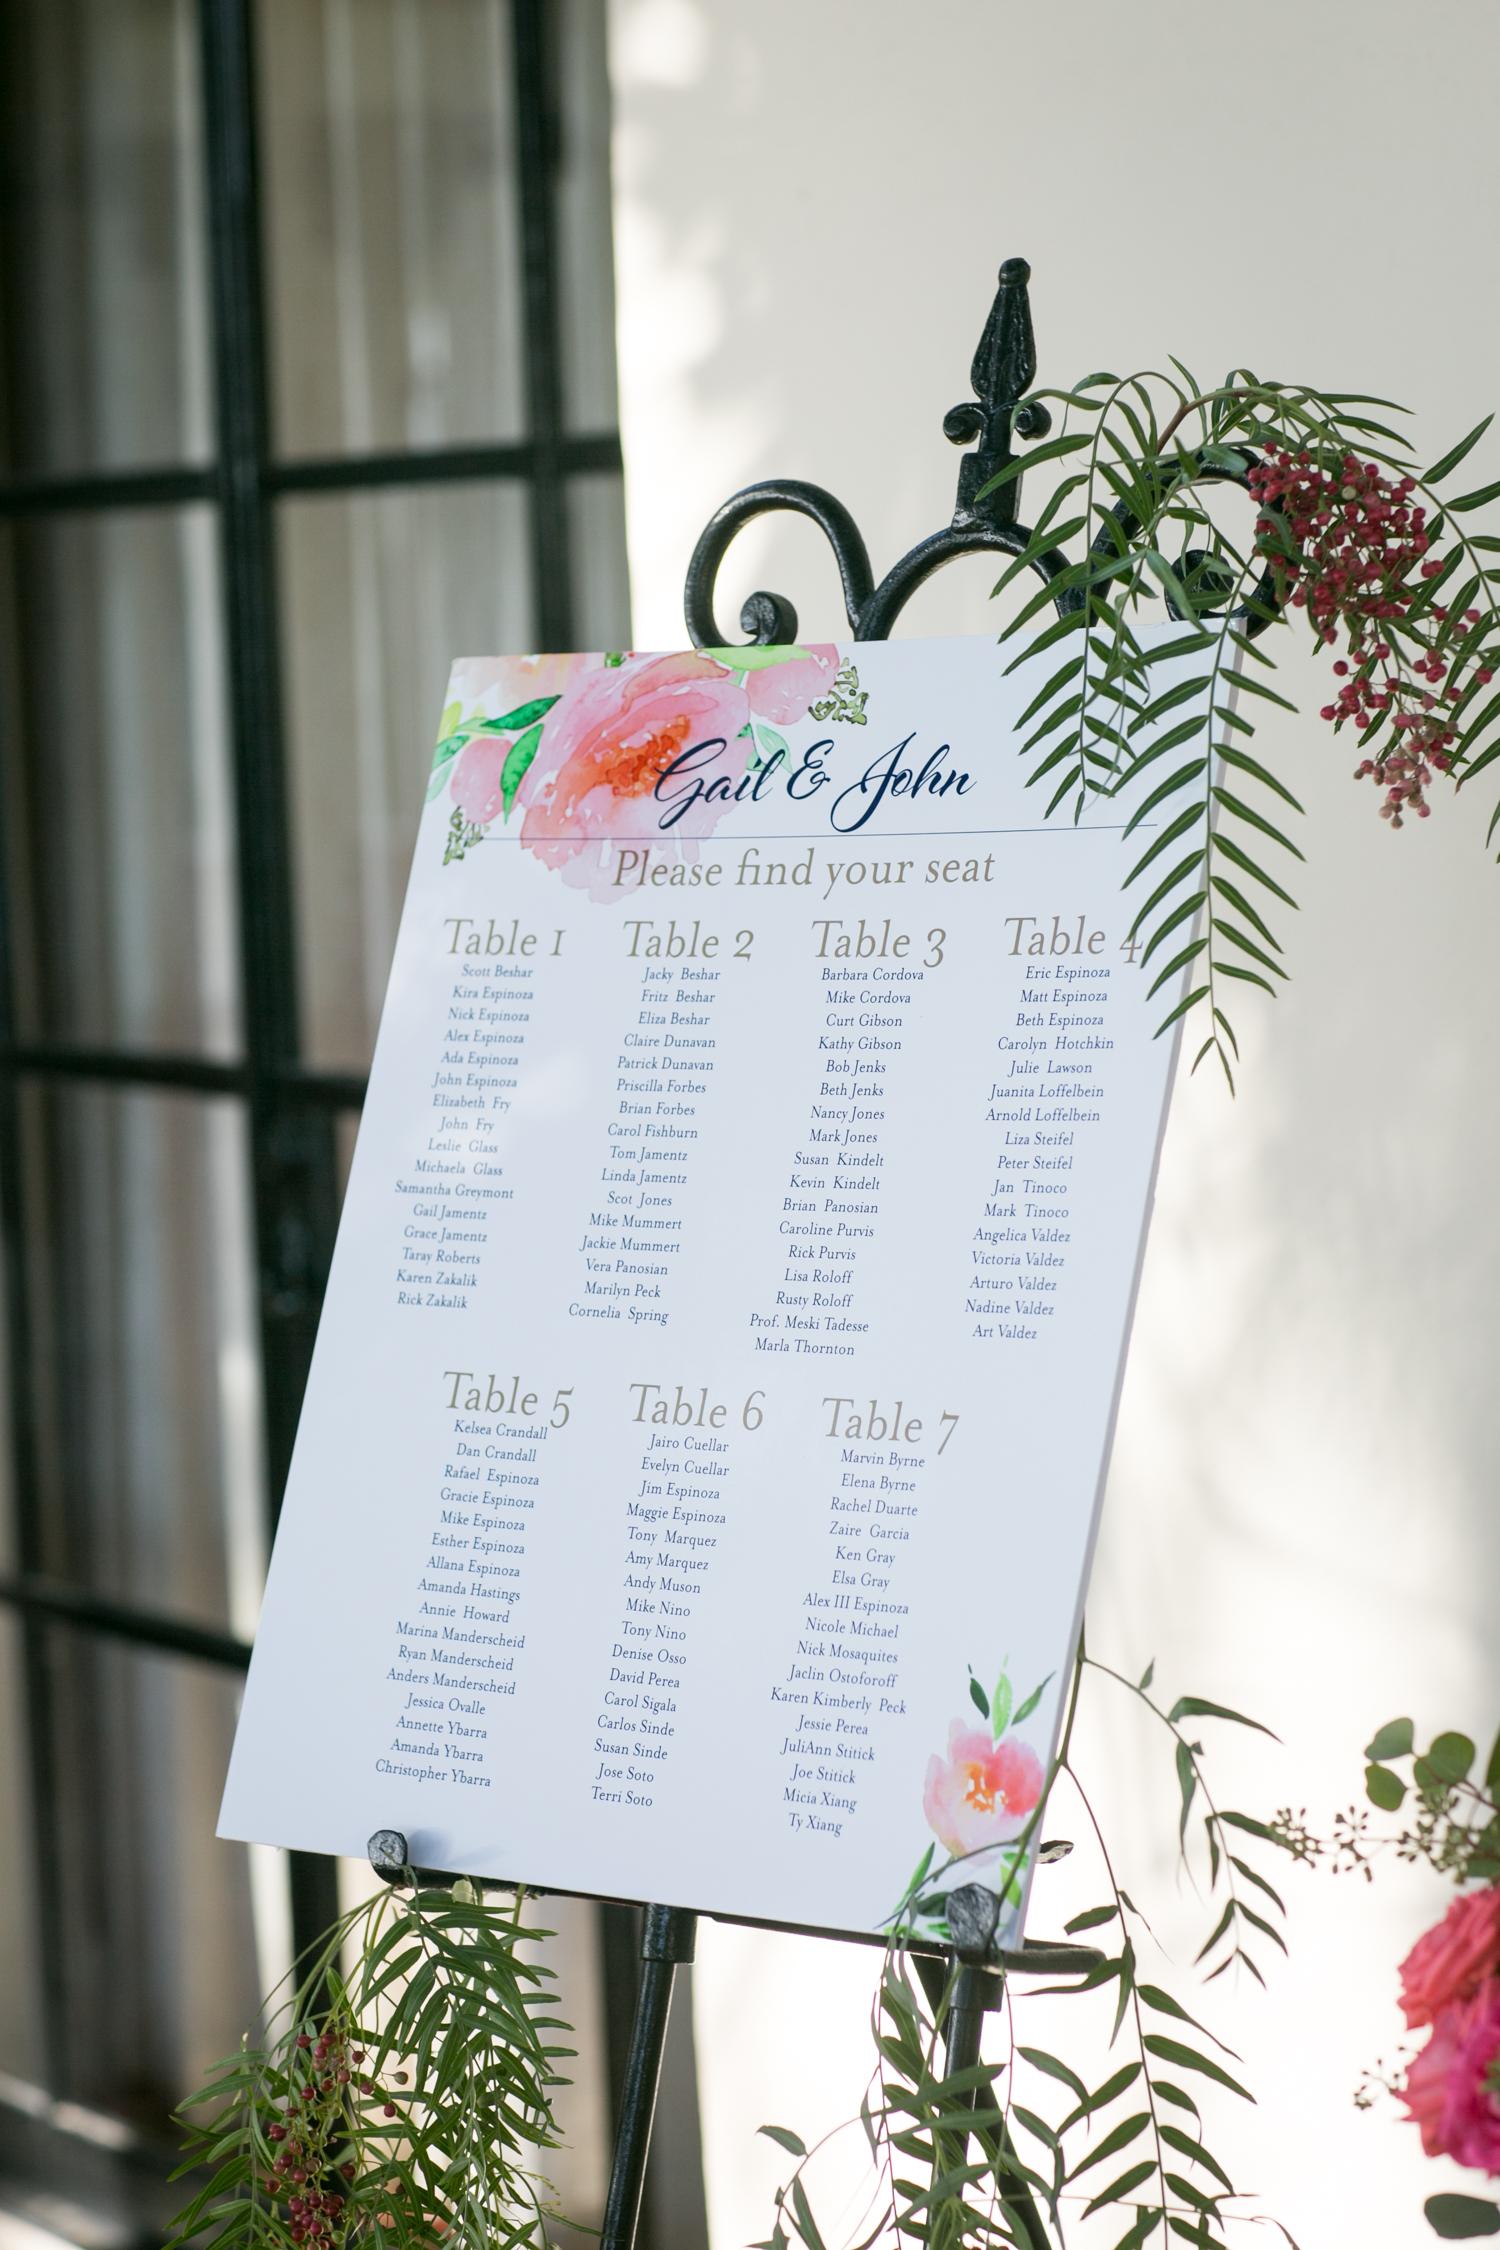 www.santabarbarawedding.com | Miki & Sonja Photography | Four Seasons Resort The Biltmore | Imagine Weddings & Special Events | Table Arrangements Poster